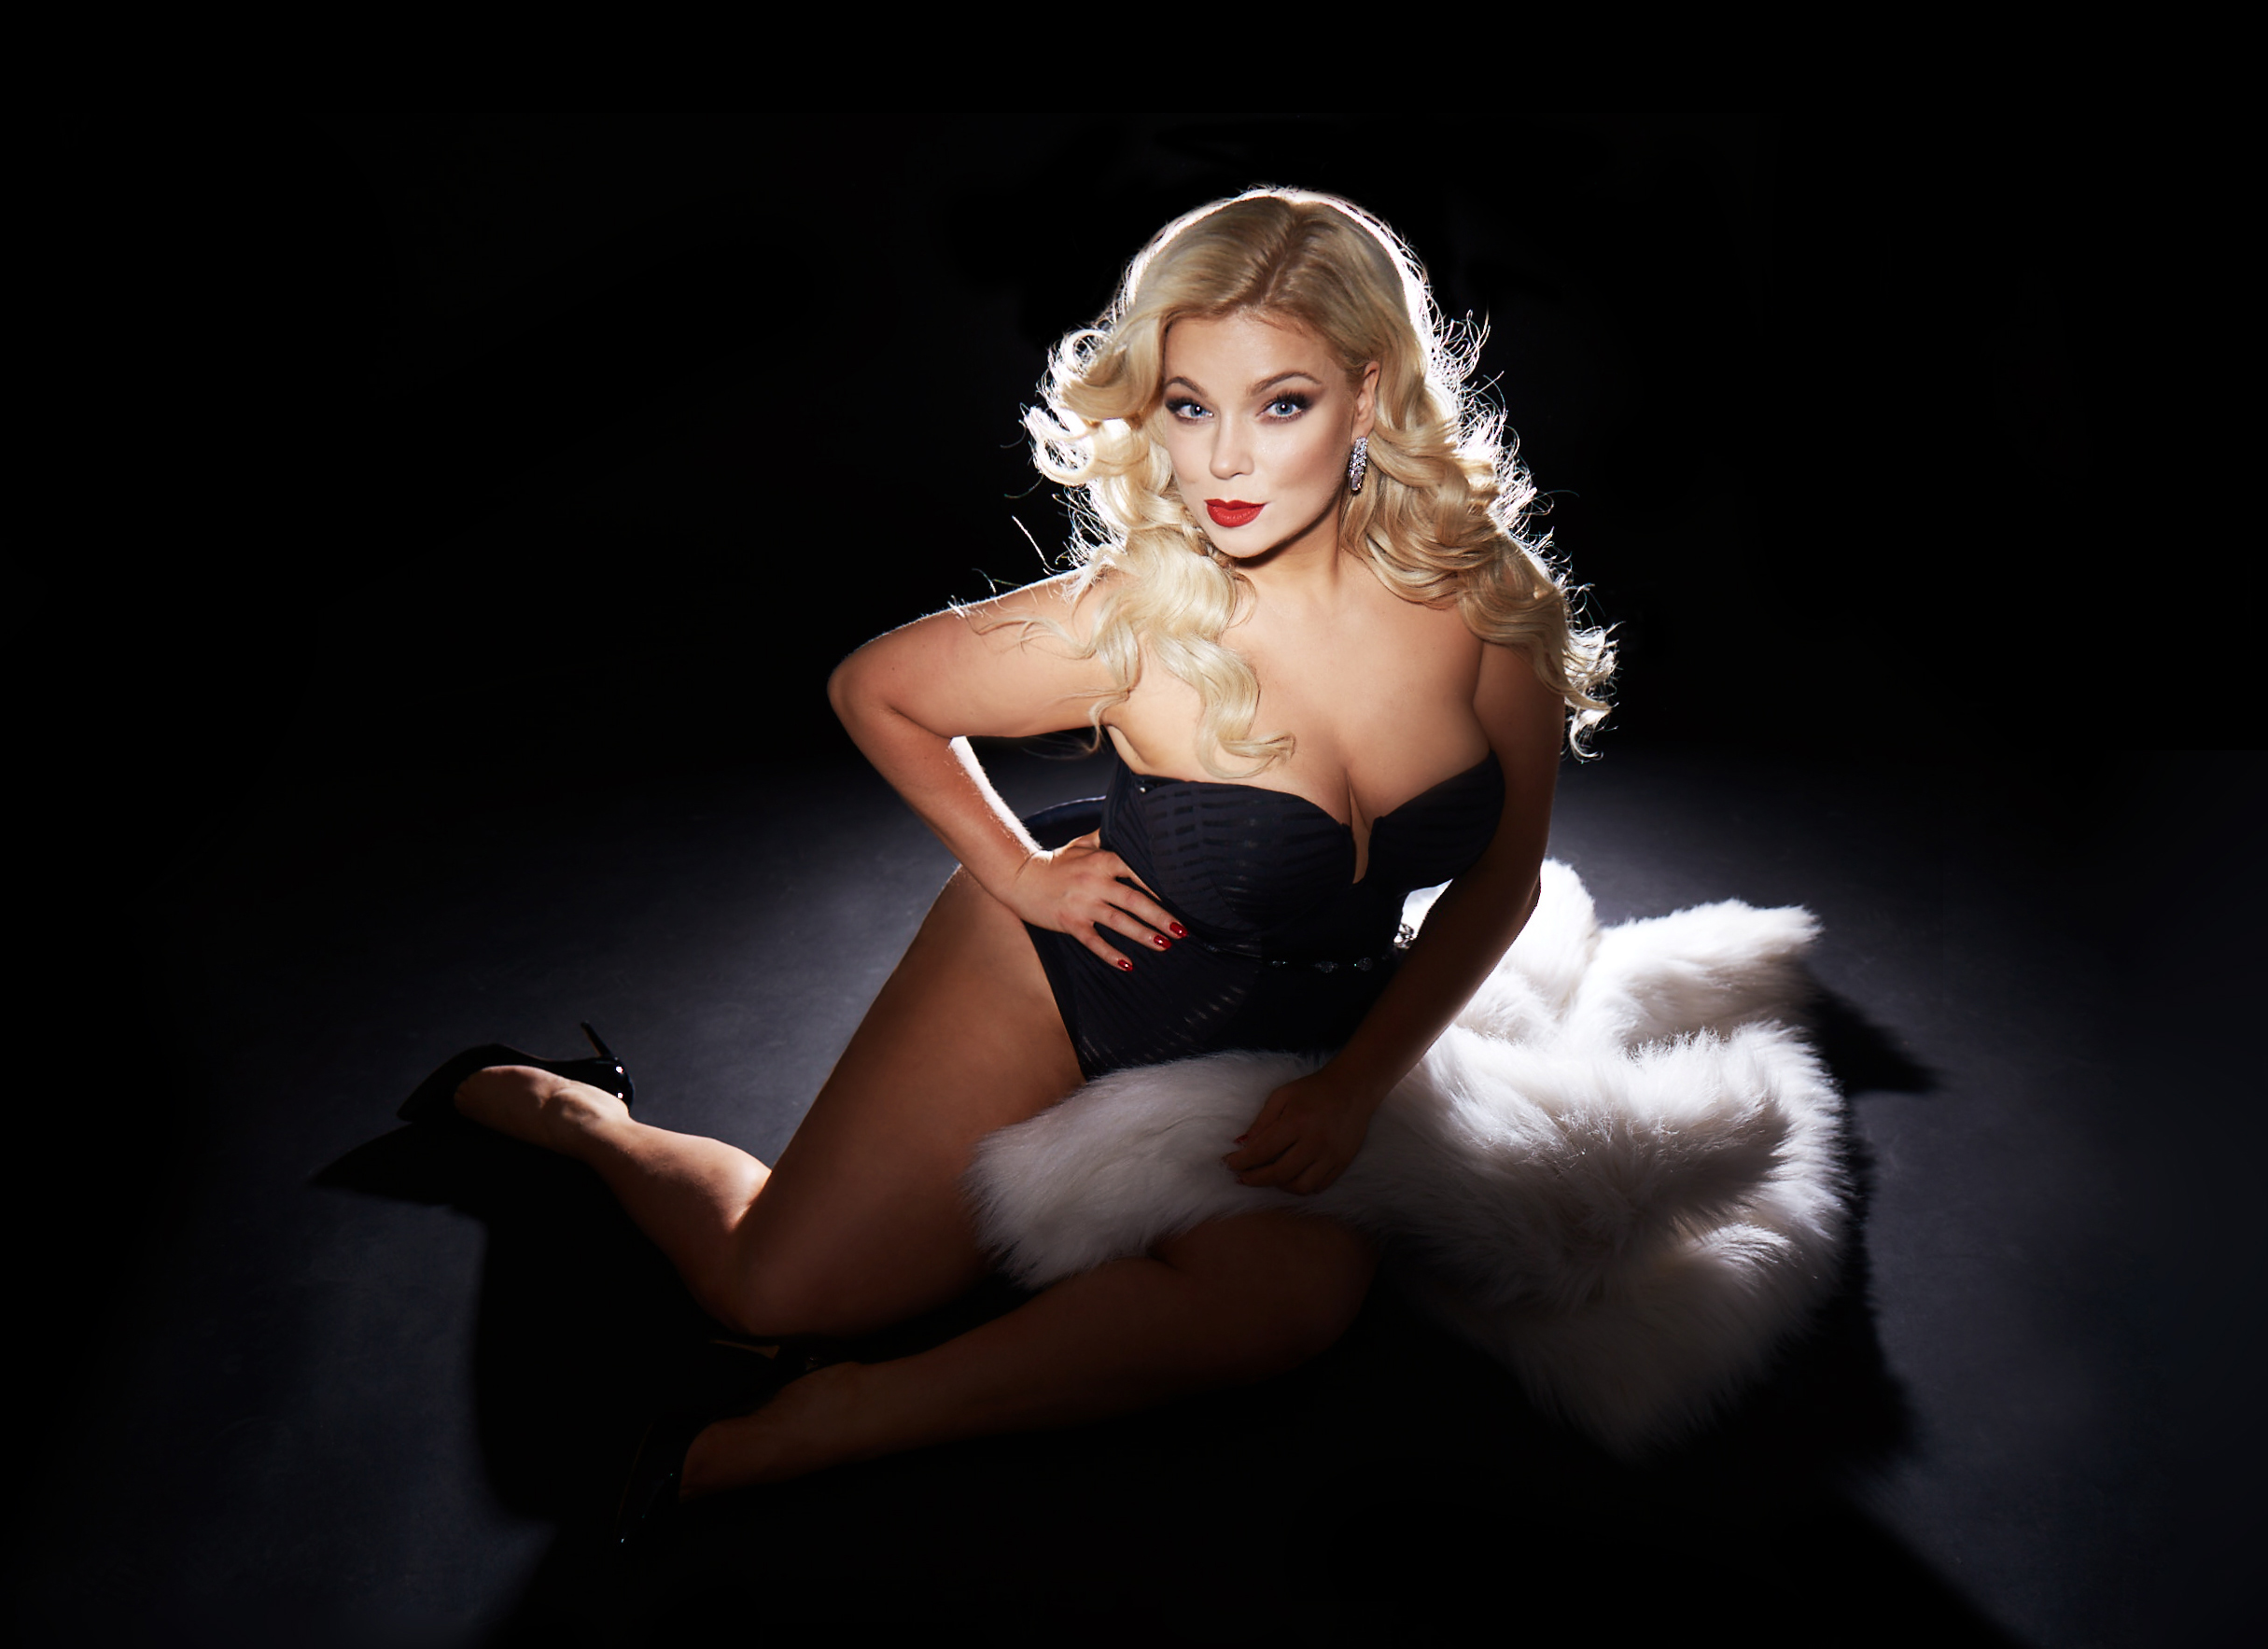 Caterina-pogorzelski-Megabambi-Kupferfux-Glamour-Curvy-Model-Plussize-Blogger